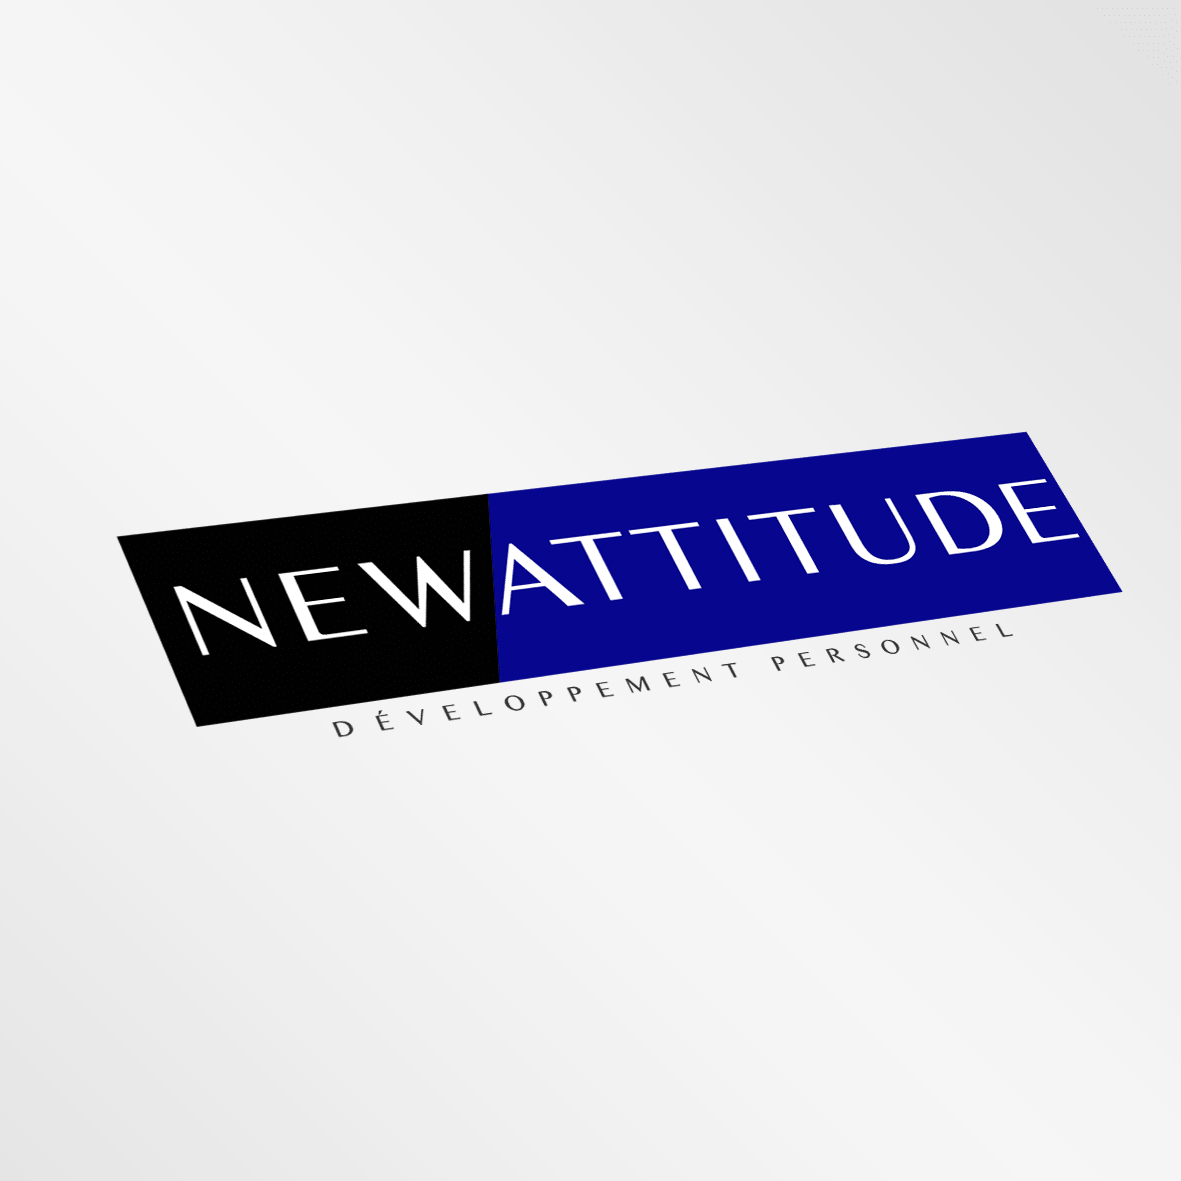 mockup_logo_new_attitude_lorem_agence_communication_graphiste_angers_maine_et_loire